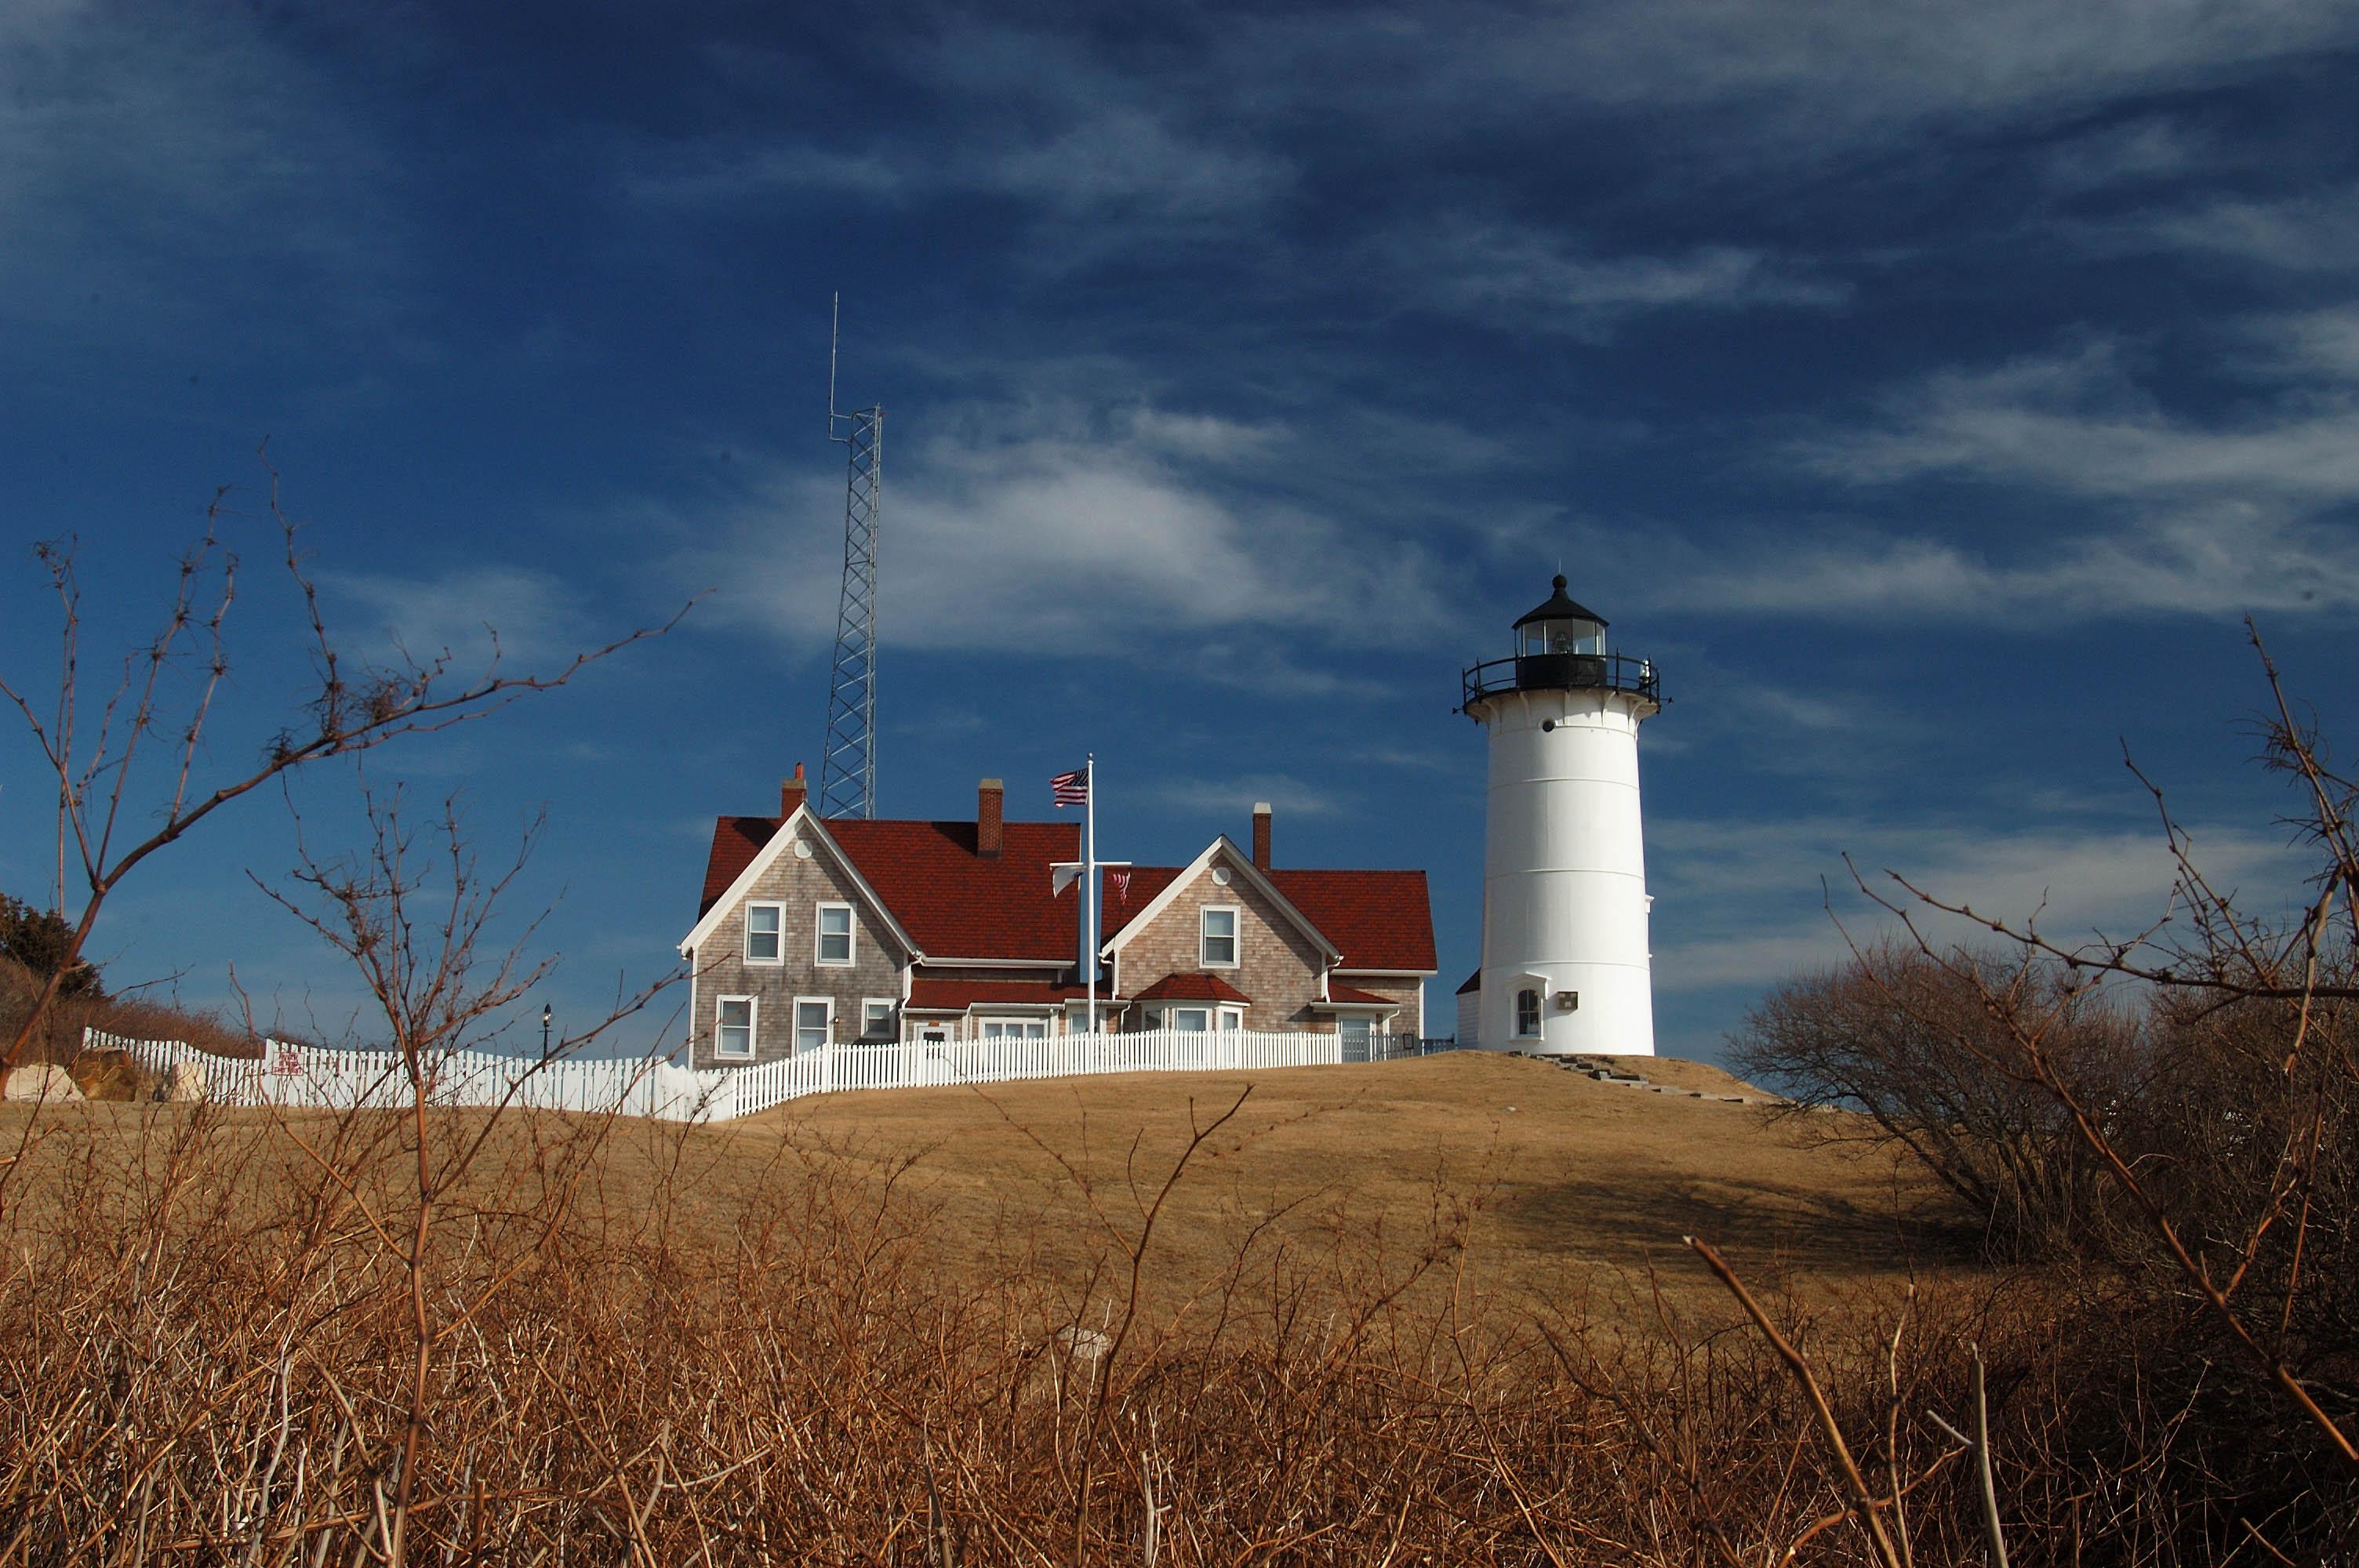 westport cape cod nobska point lighthouse cape codjpg 3008x2000